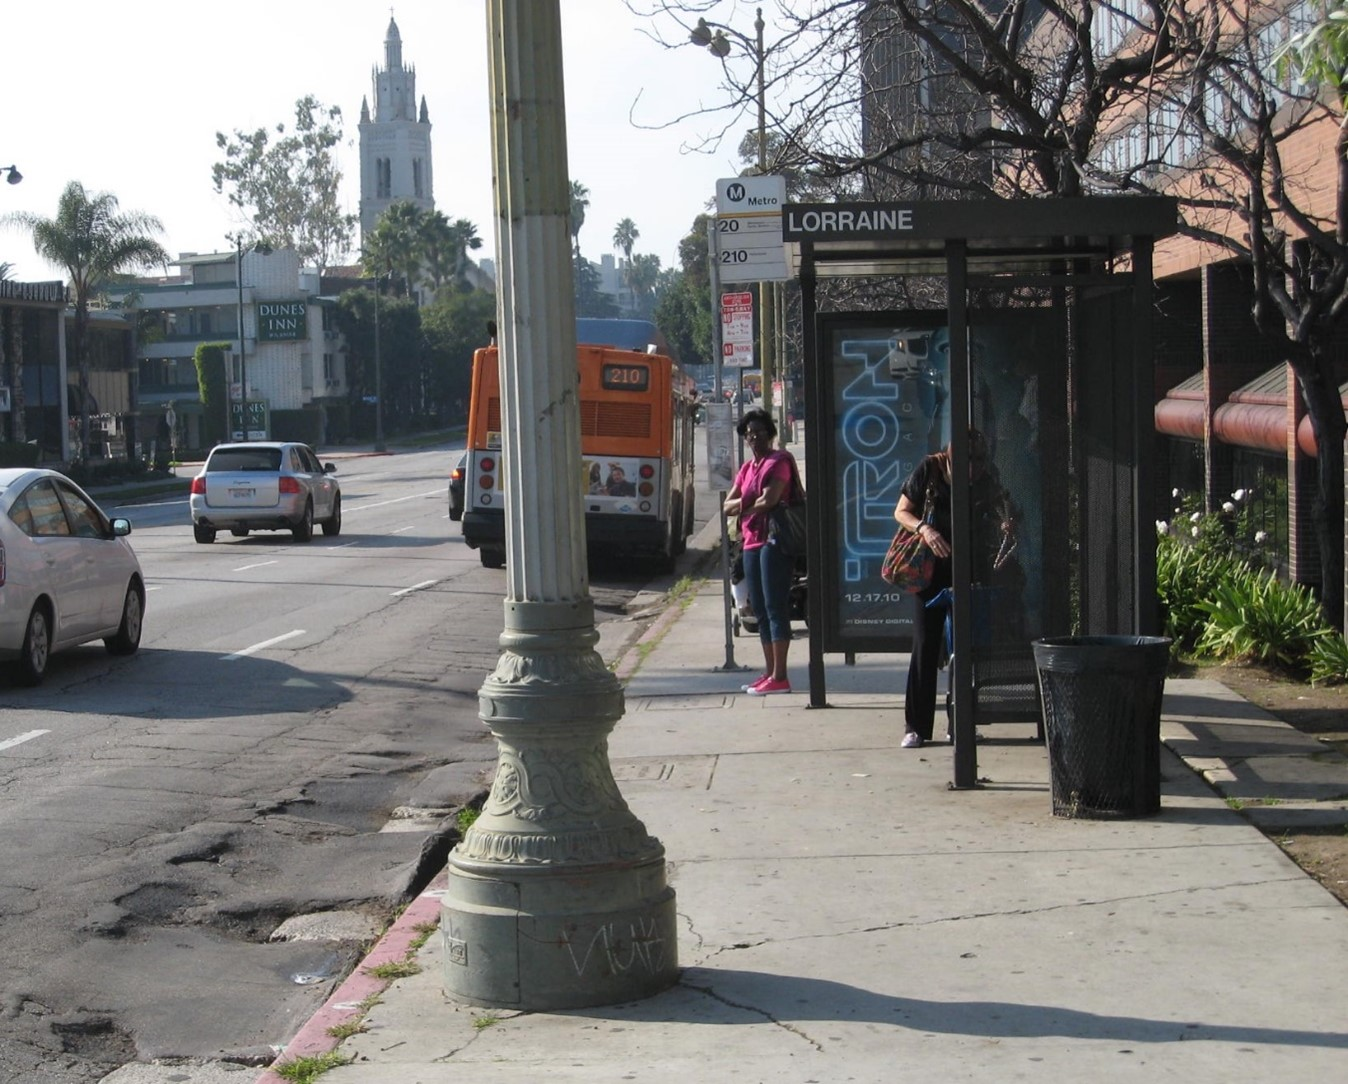 Bus Lane on Wilshire Blvd